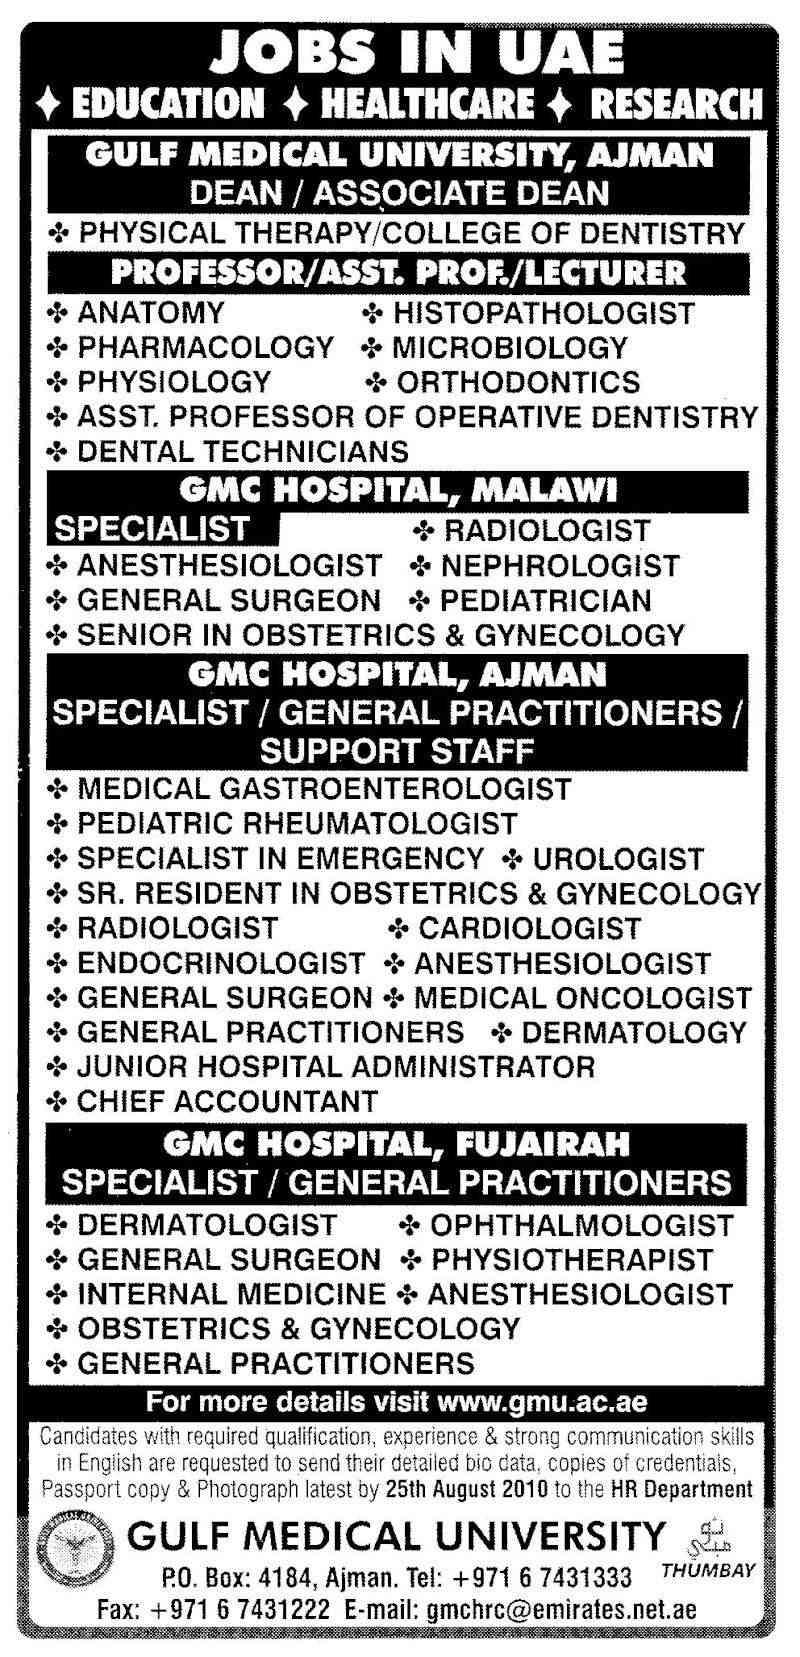 Gulf Medical University, Ajman Scan0020